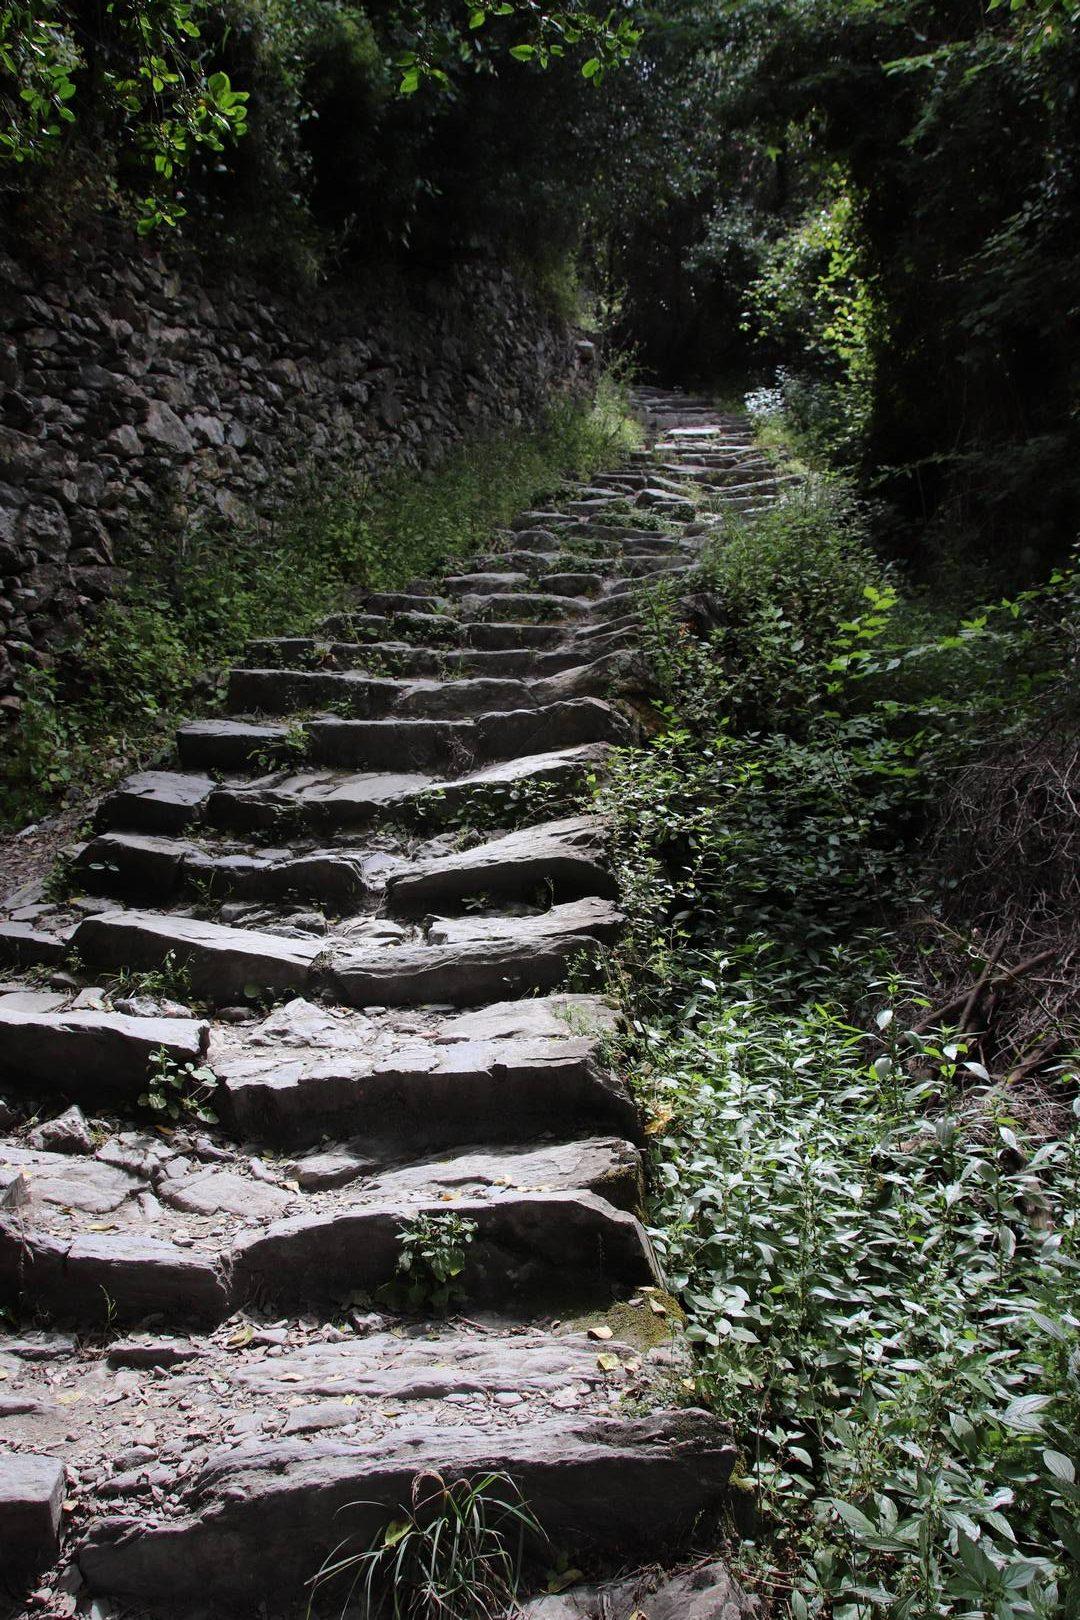 Italie - Sentier de randonnée entre Vernazza et Corniglia, parc des cinque terre